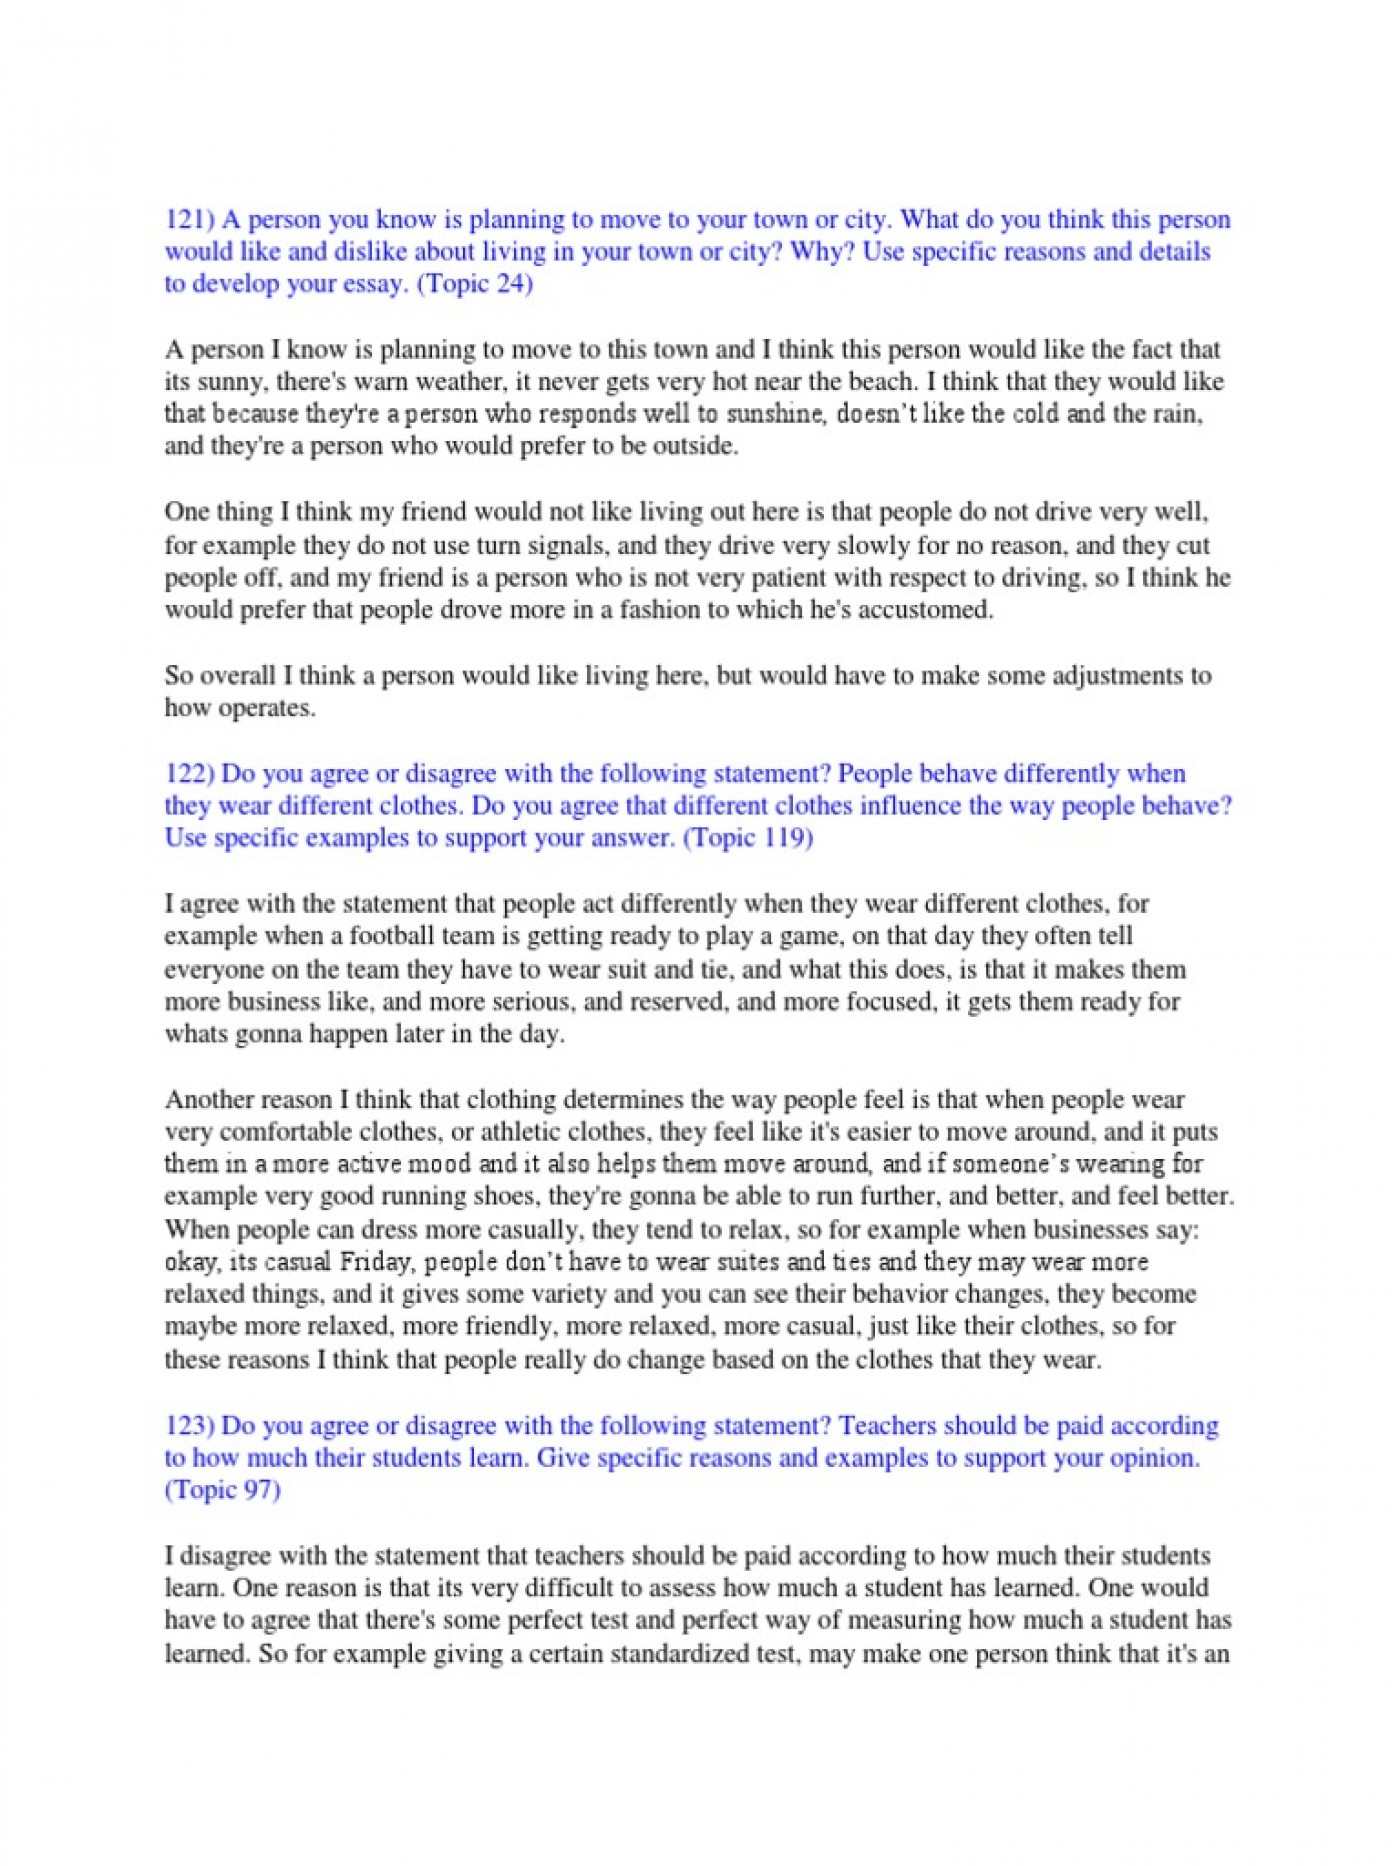 006 Toefl Ibt Essay Topics Example Success Speaking Writing Sample  58517ac4b6d87fb8408b582e Striking 20151400